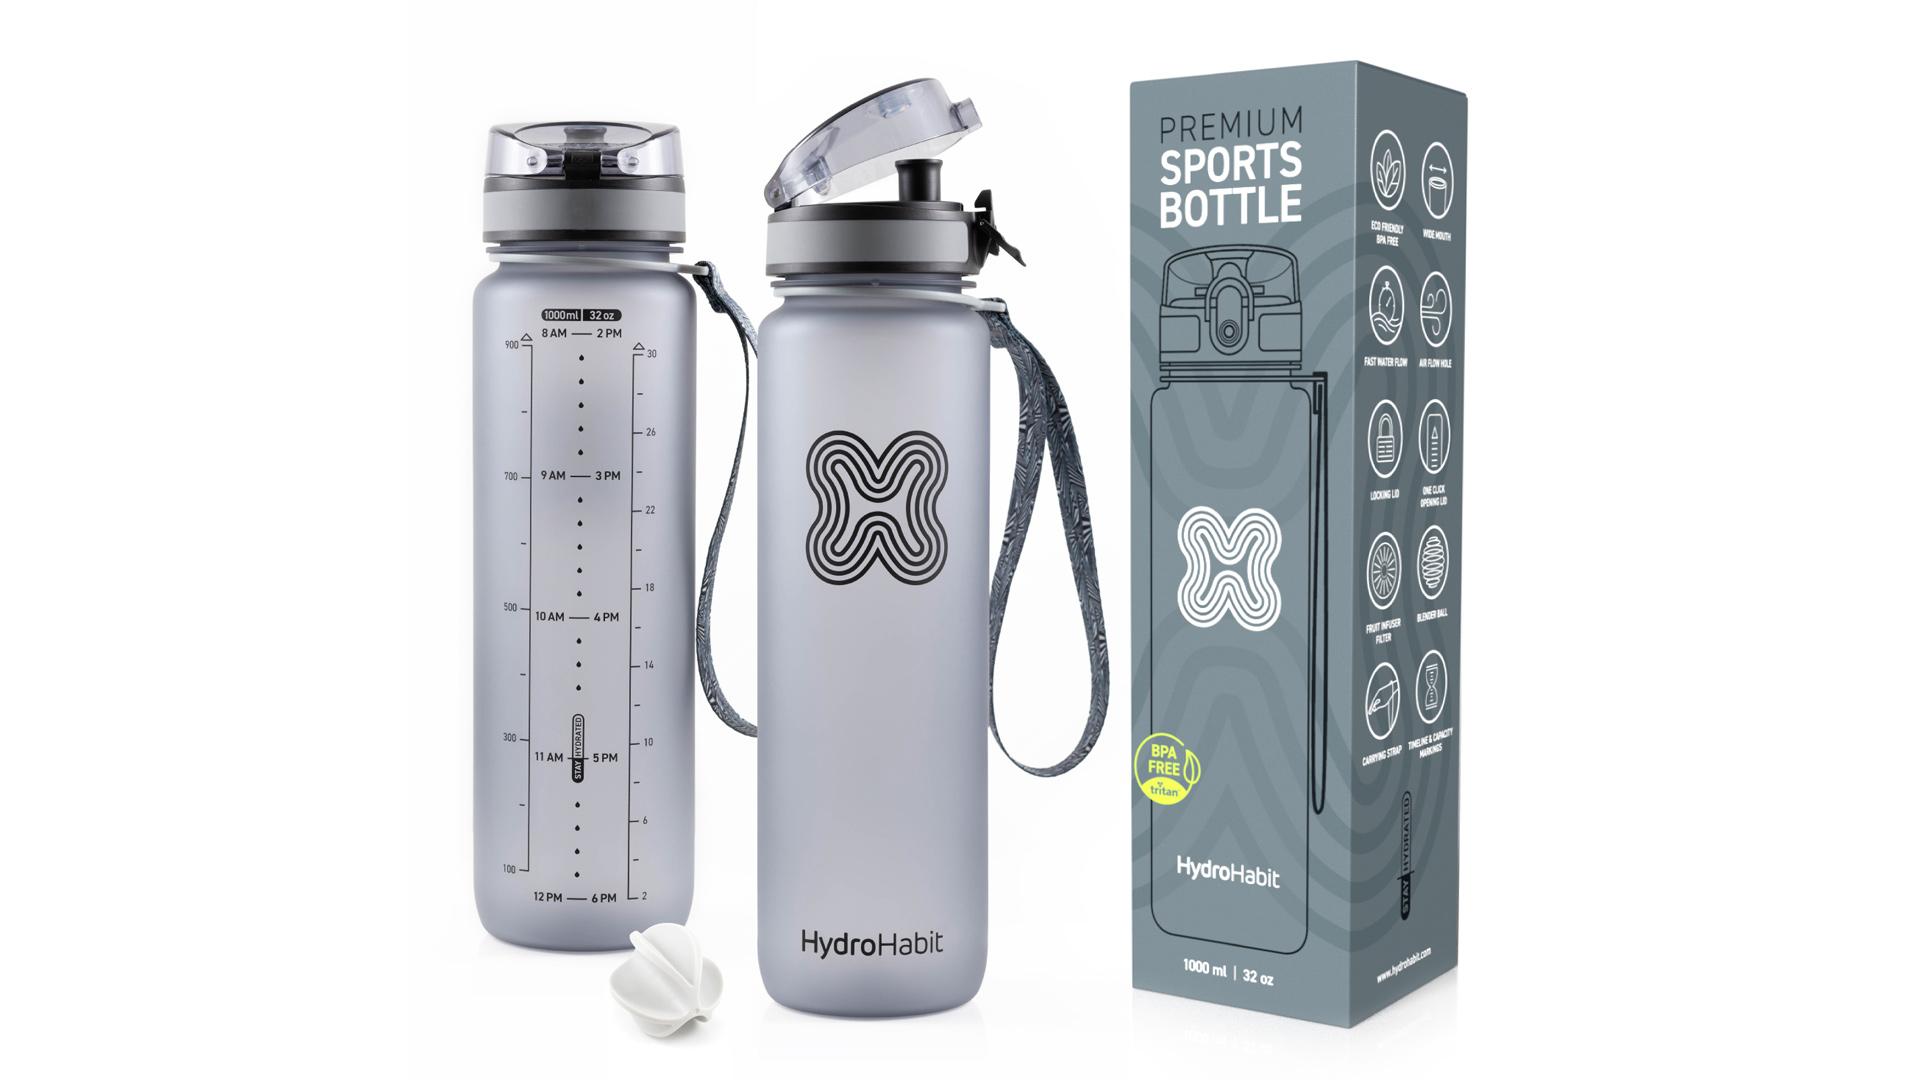 Hydro Habit - Premium Sports Bottle